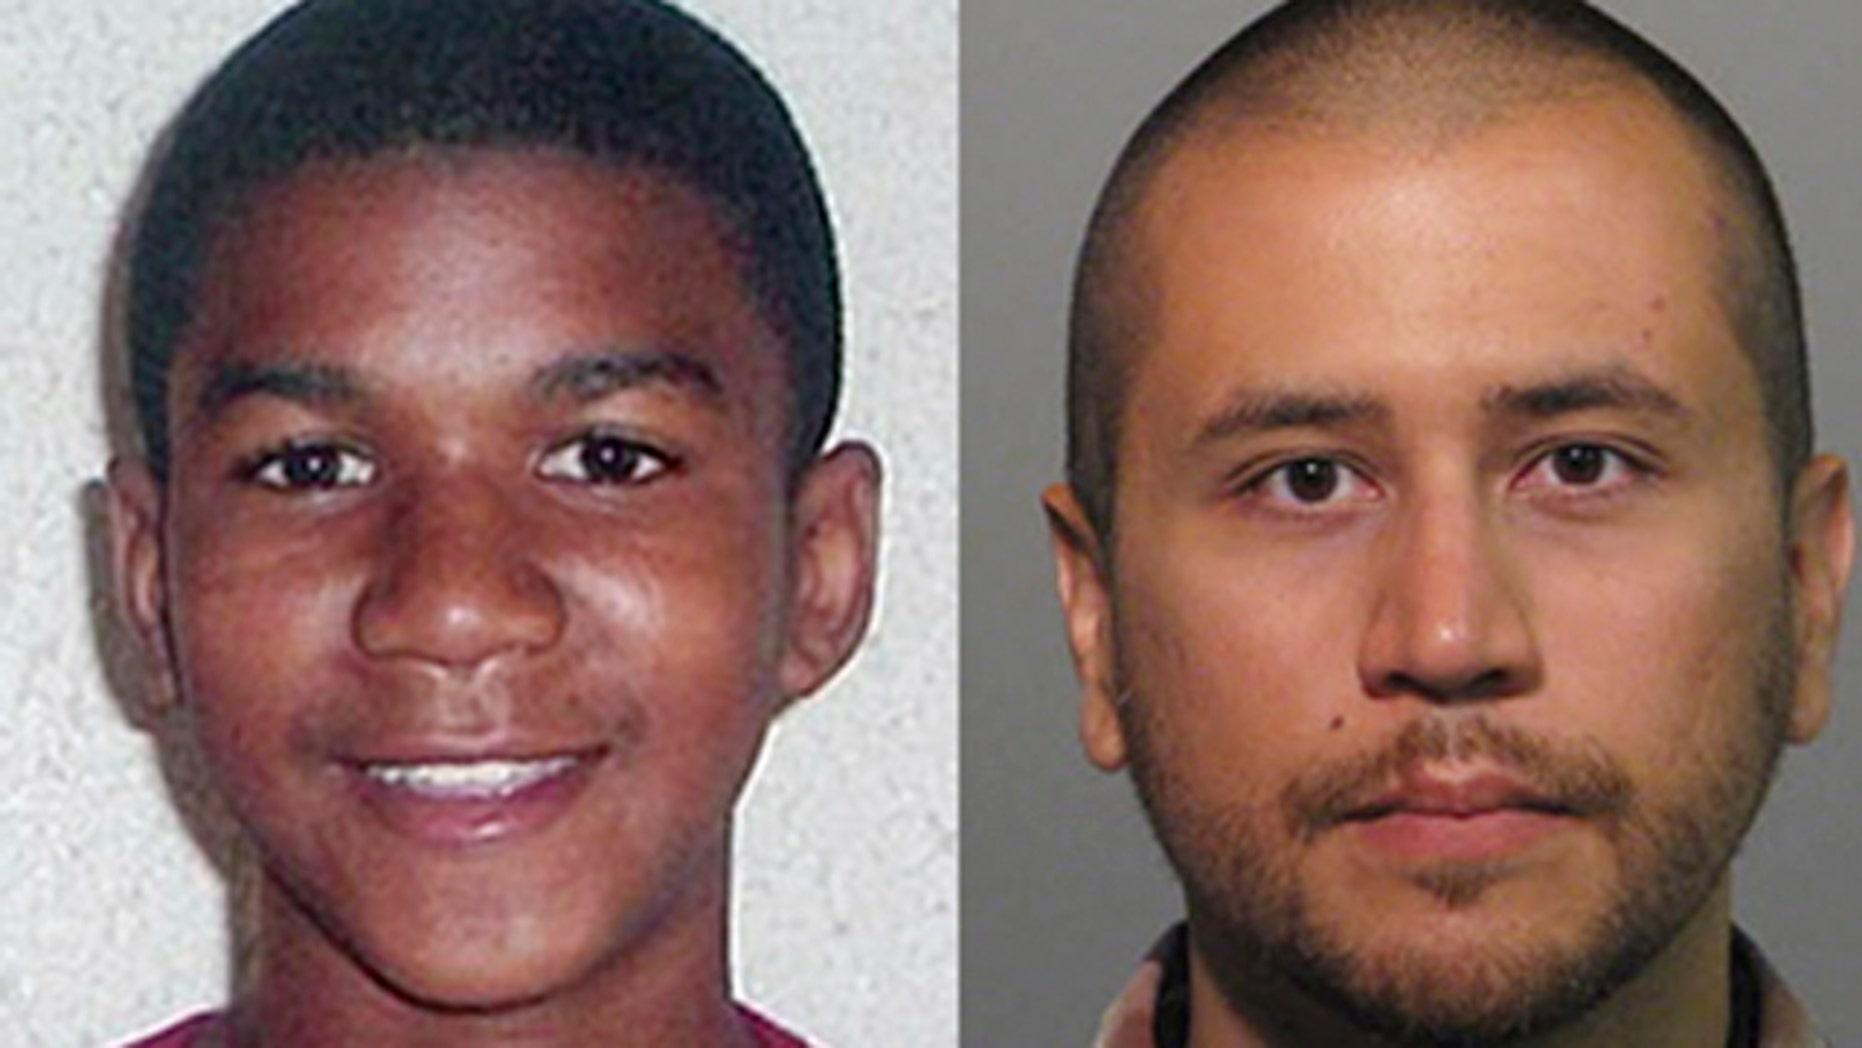 Trayvon Martin and George Zimmerman.